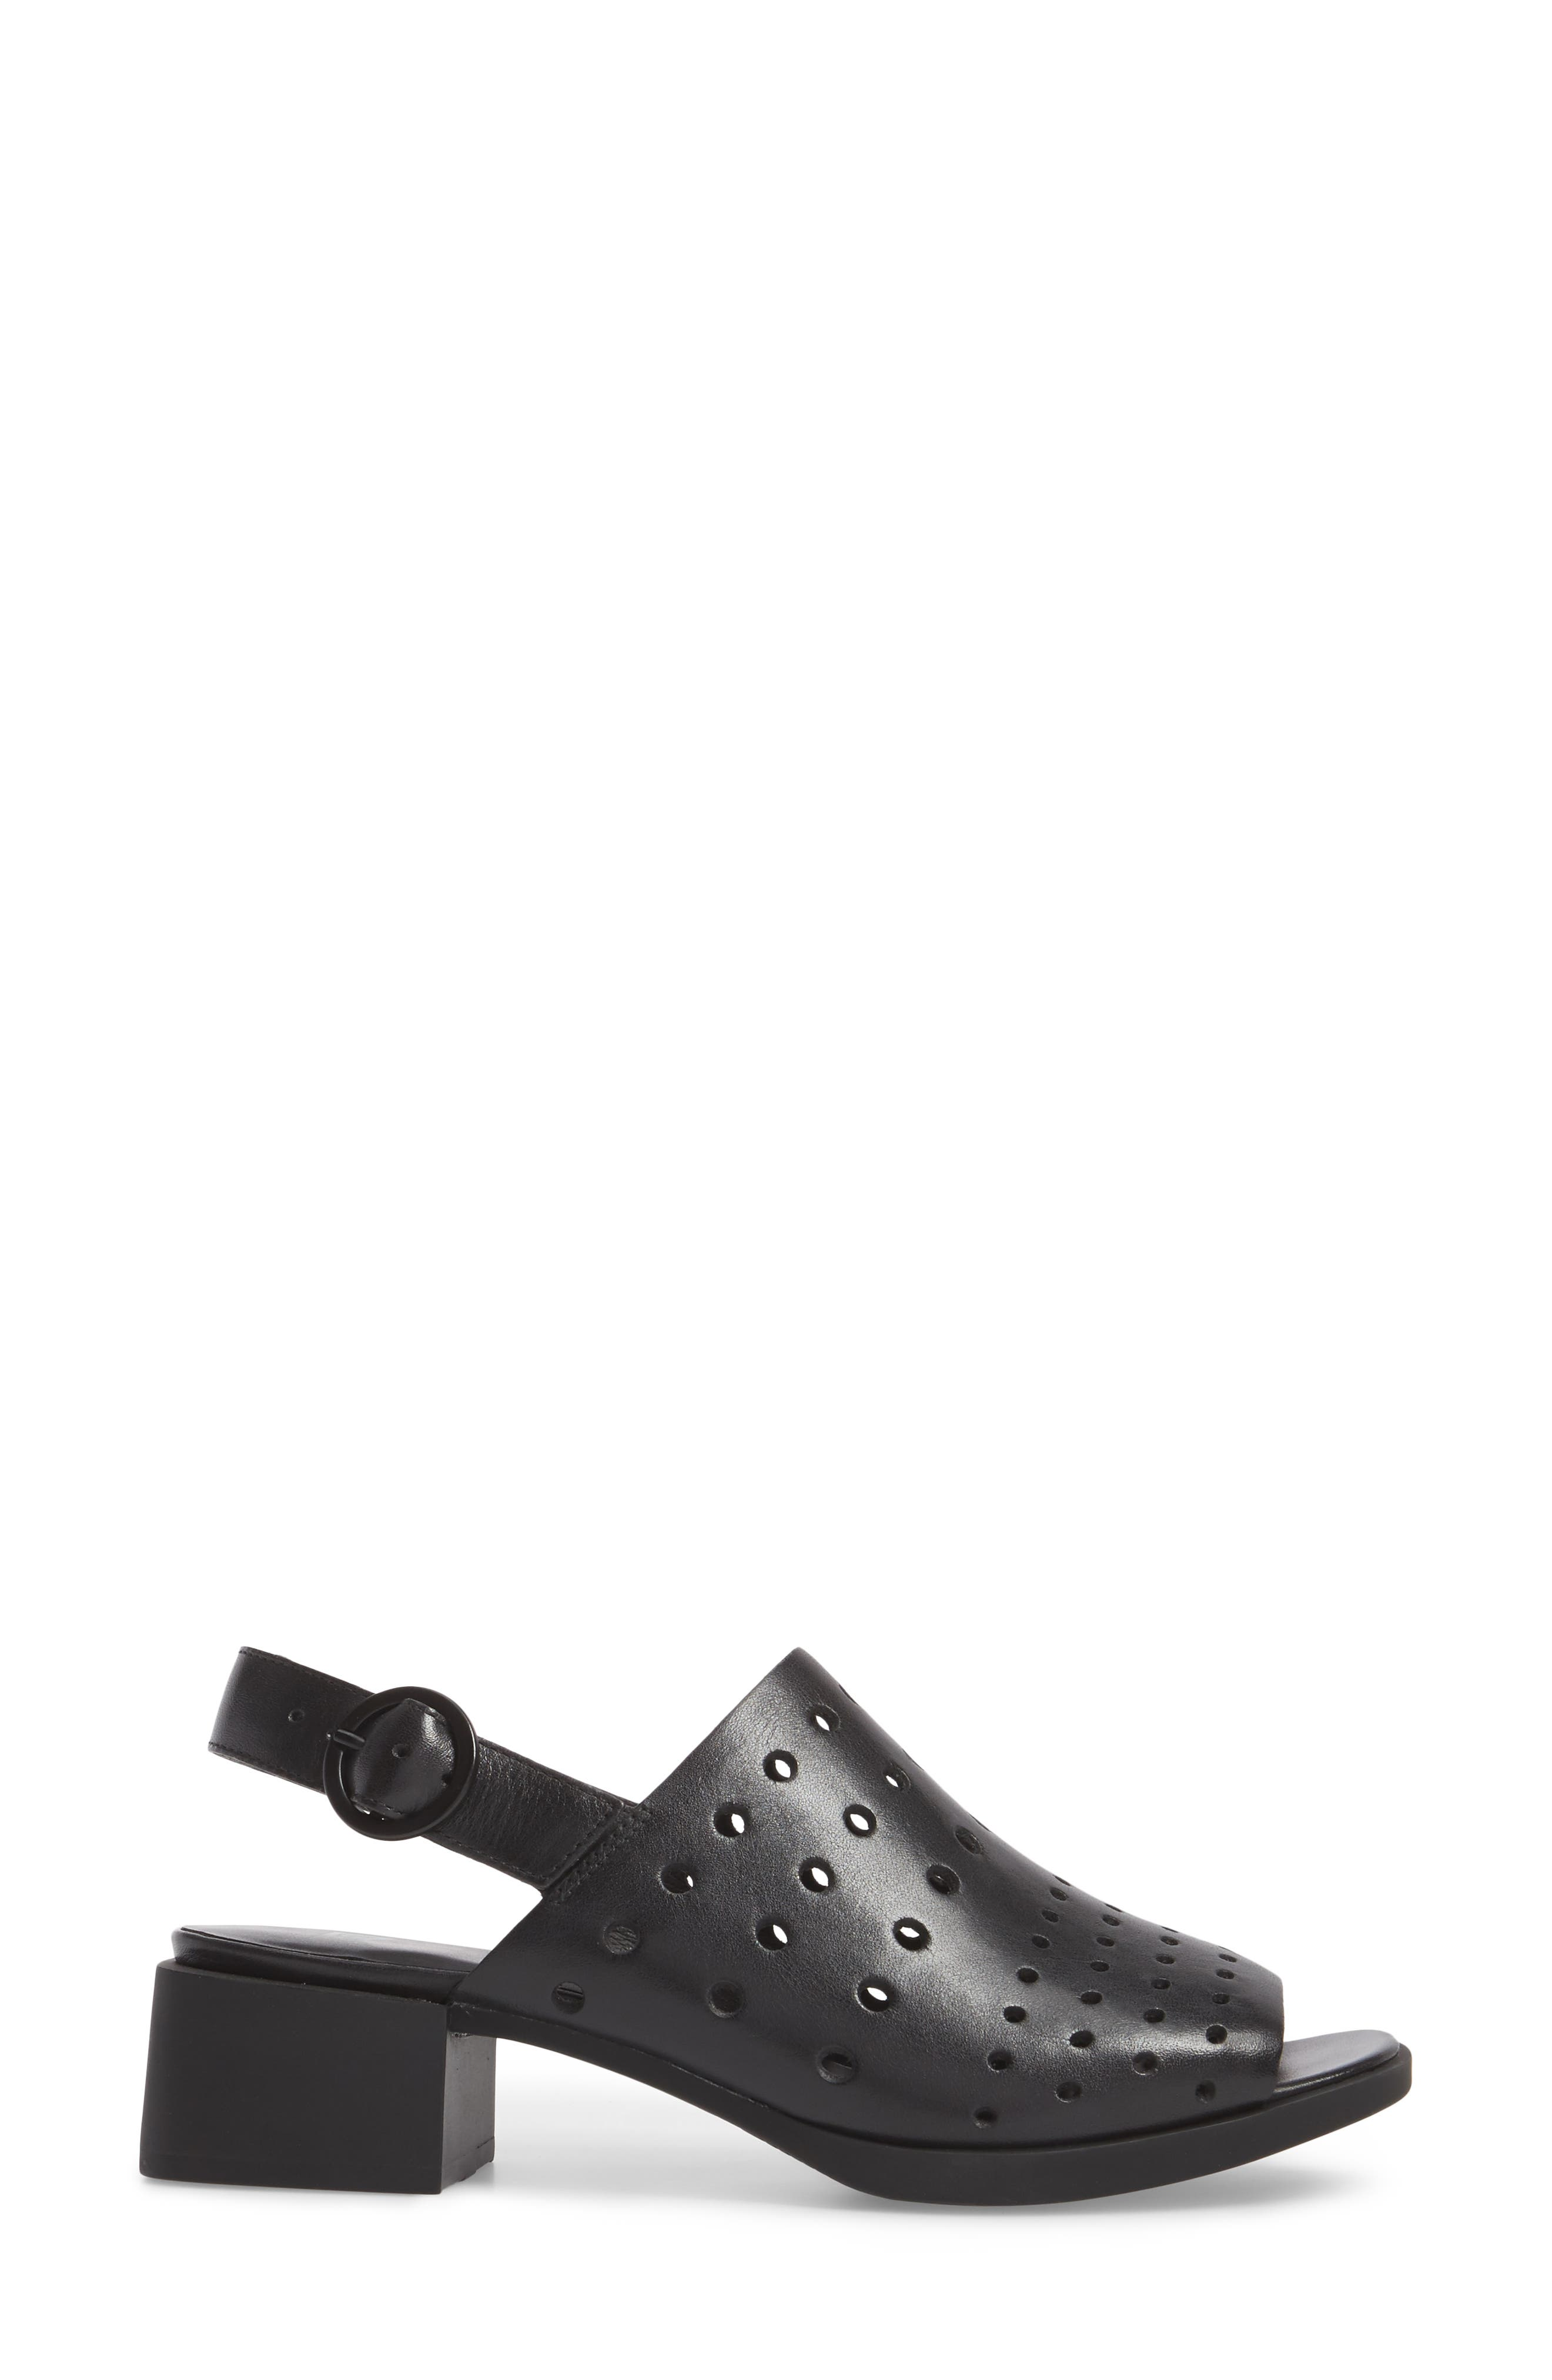 Twins Sandal,                             Alternate thumbnail 3, color,                             Black Leather